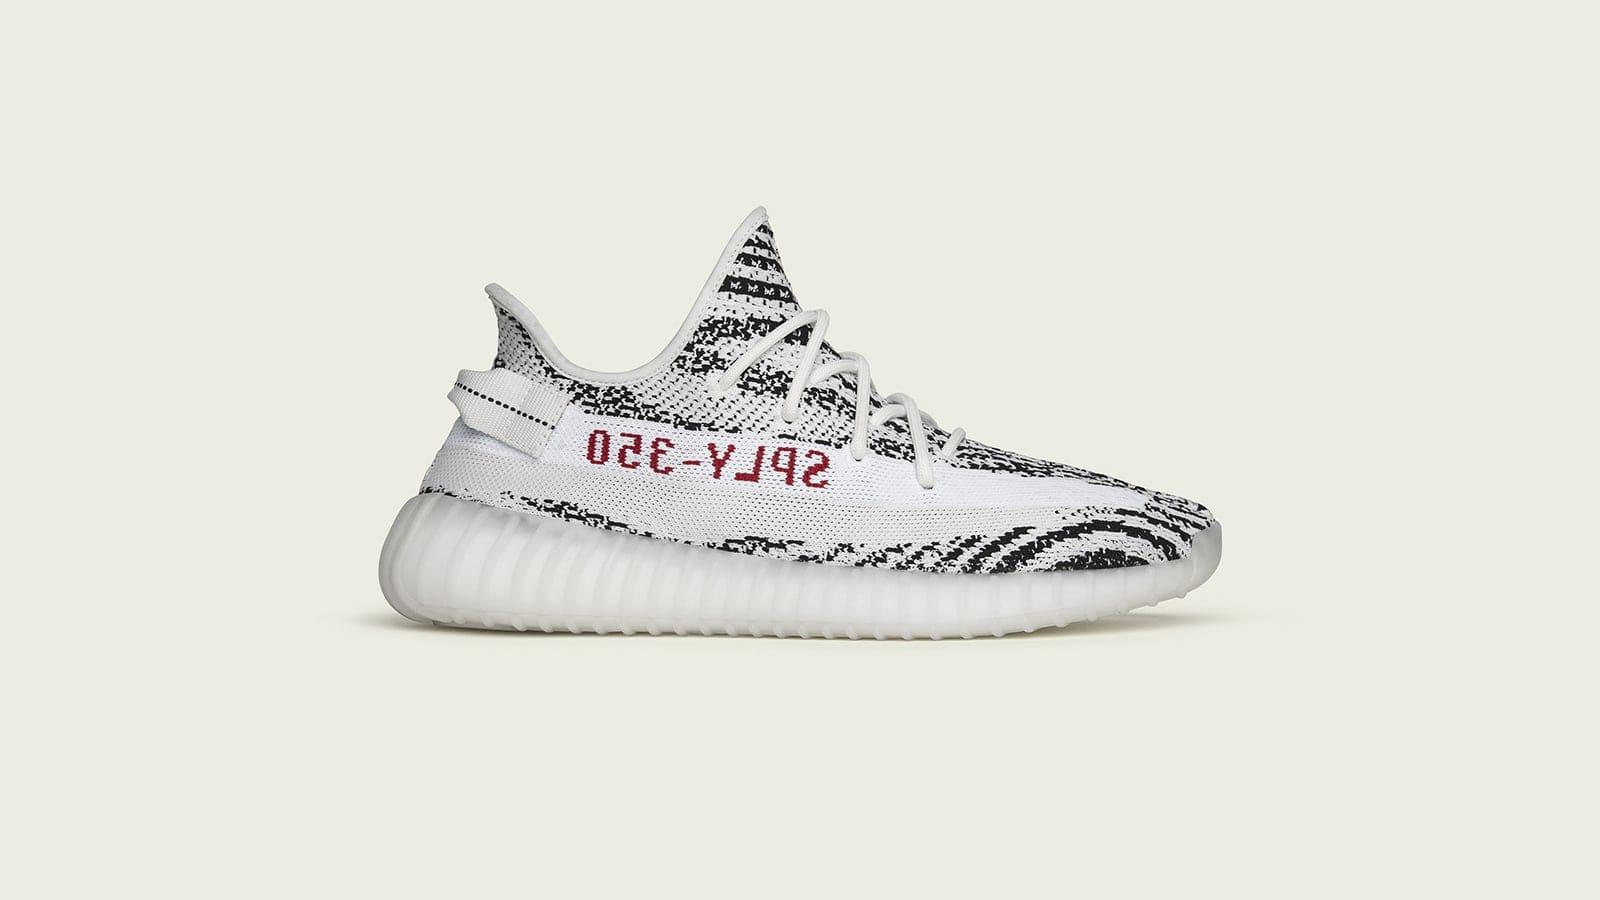 Adidas Yeezy Boost 350 V2 Zebra CP9654 Worldwide shipping is